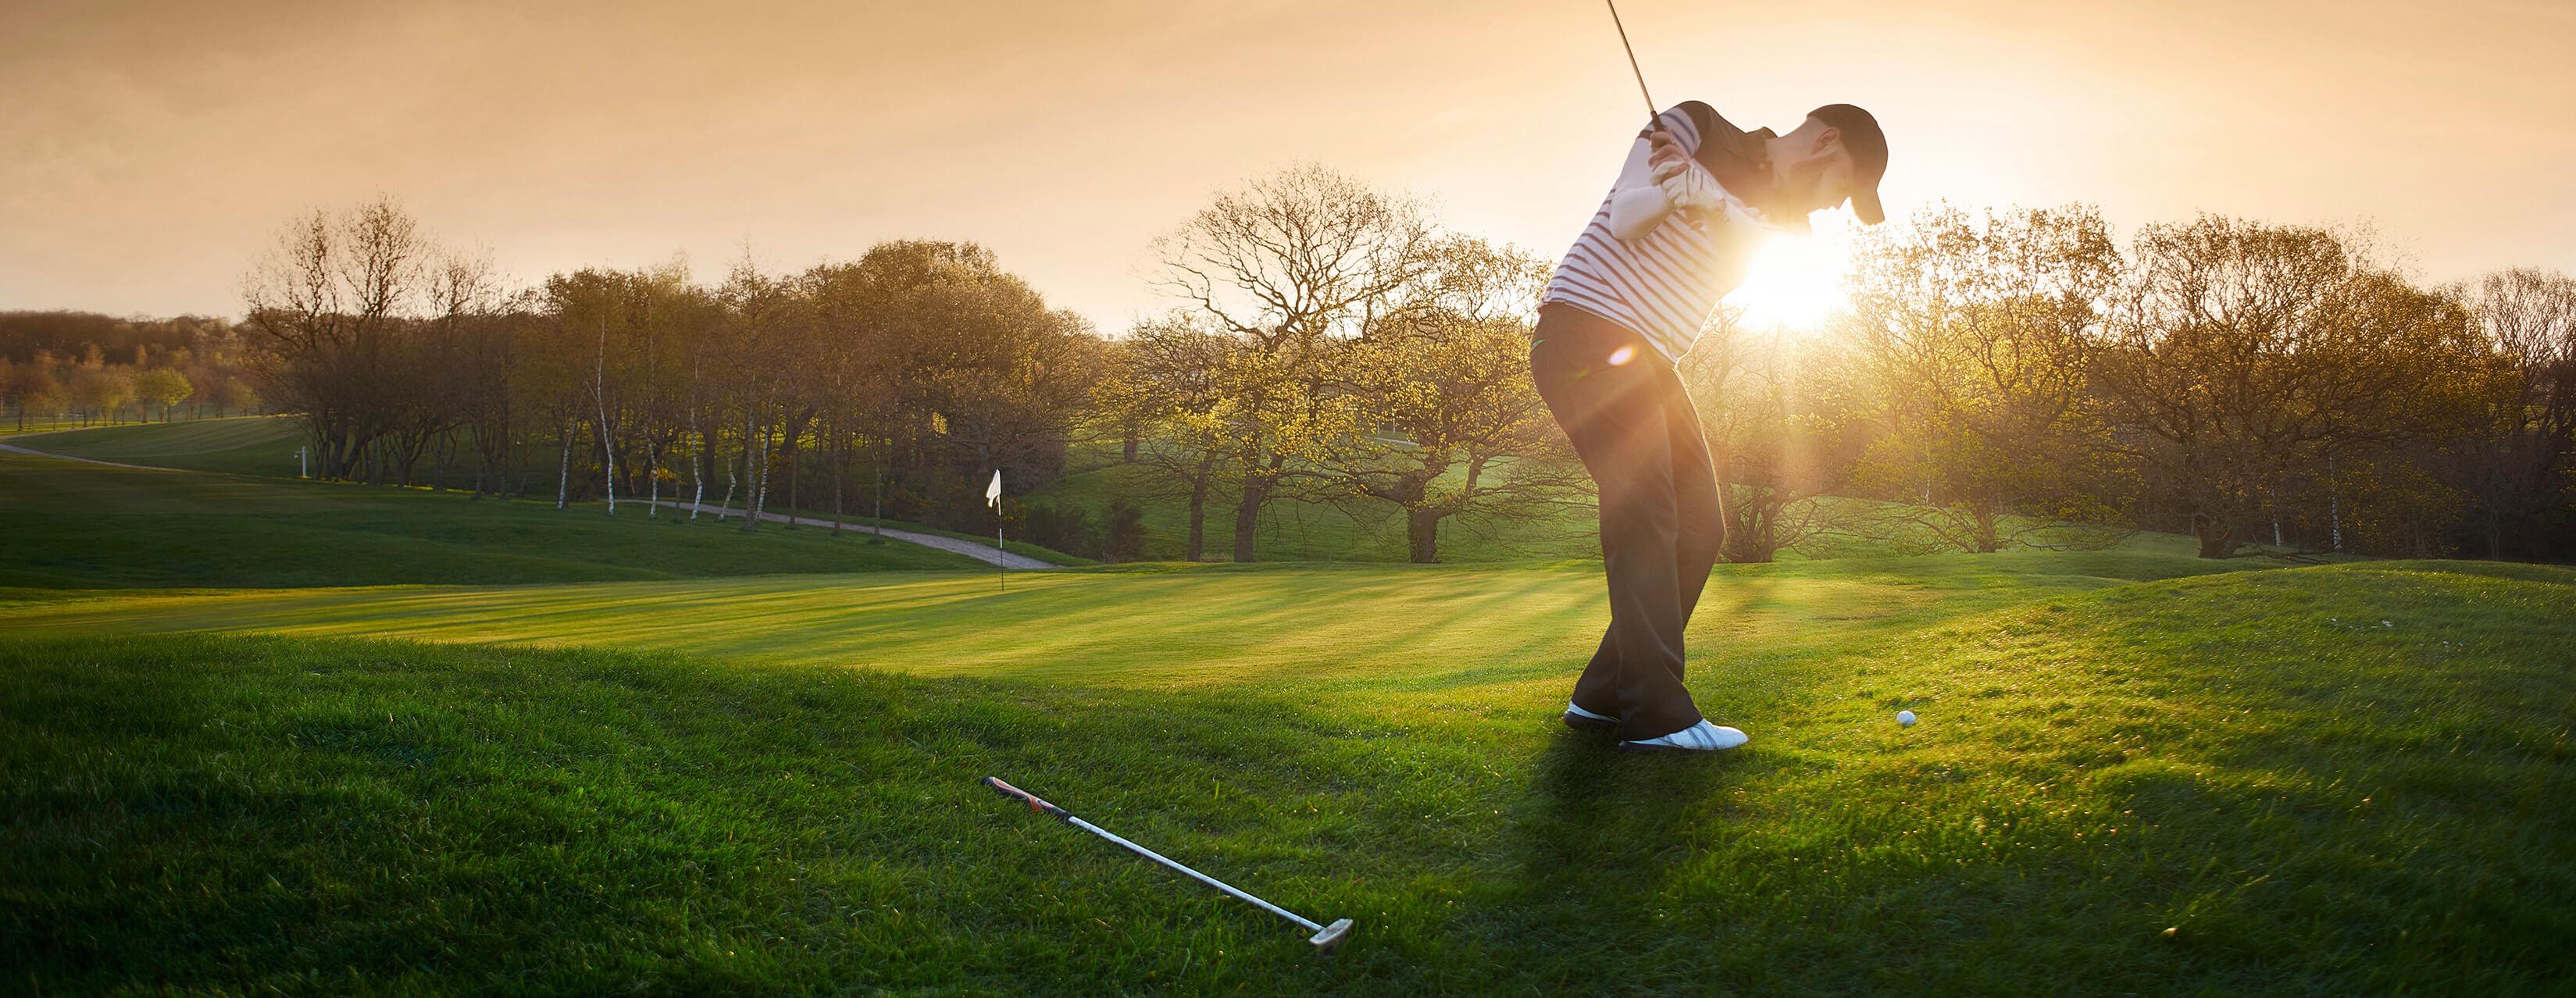 header_angebote_golf.jpg